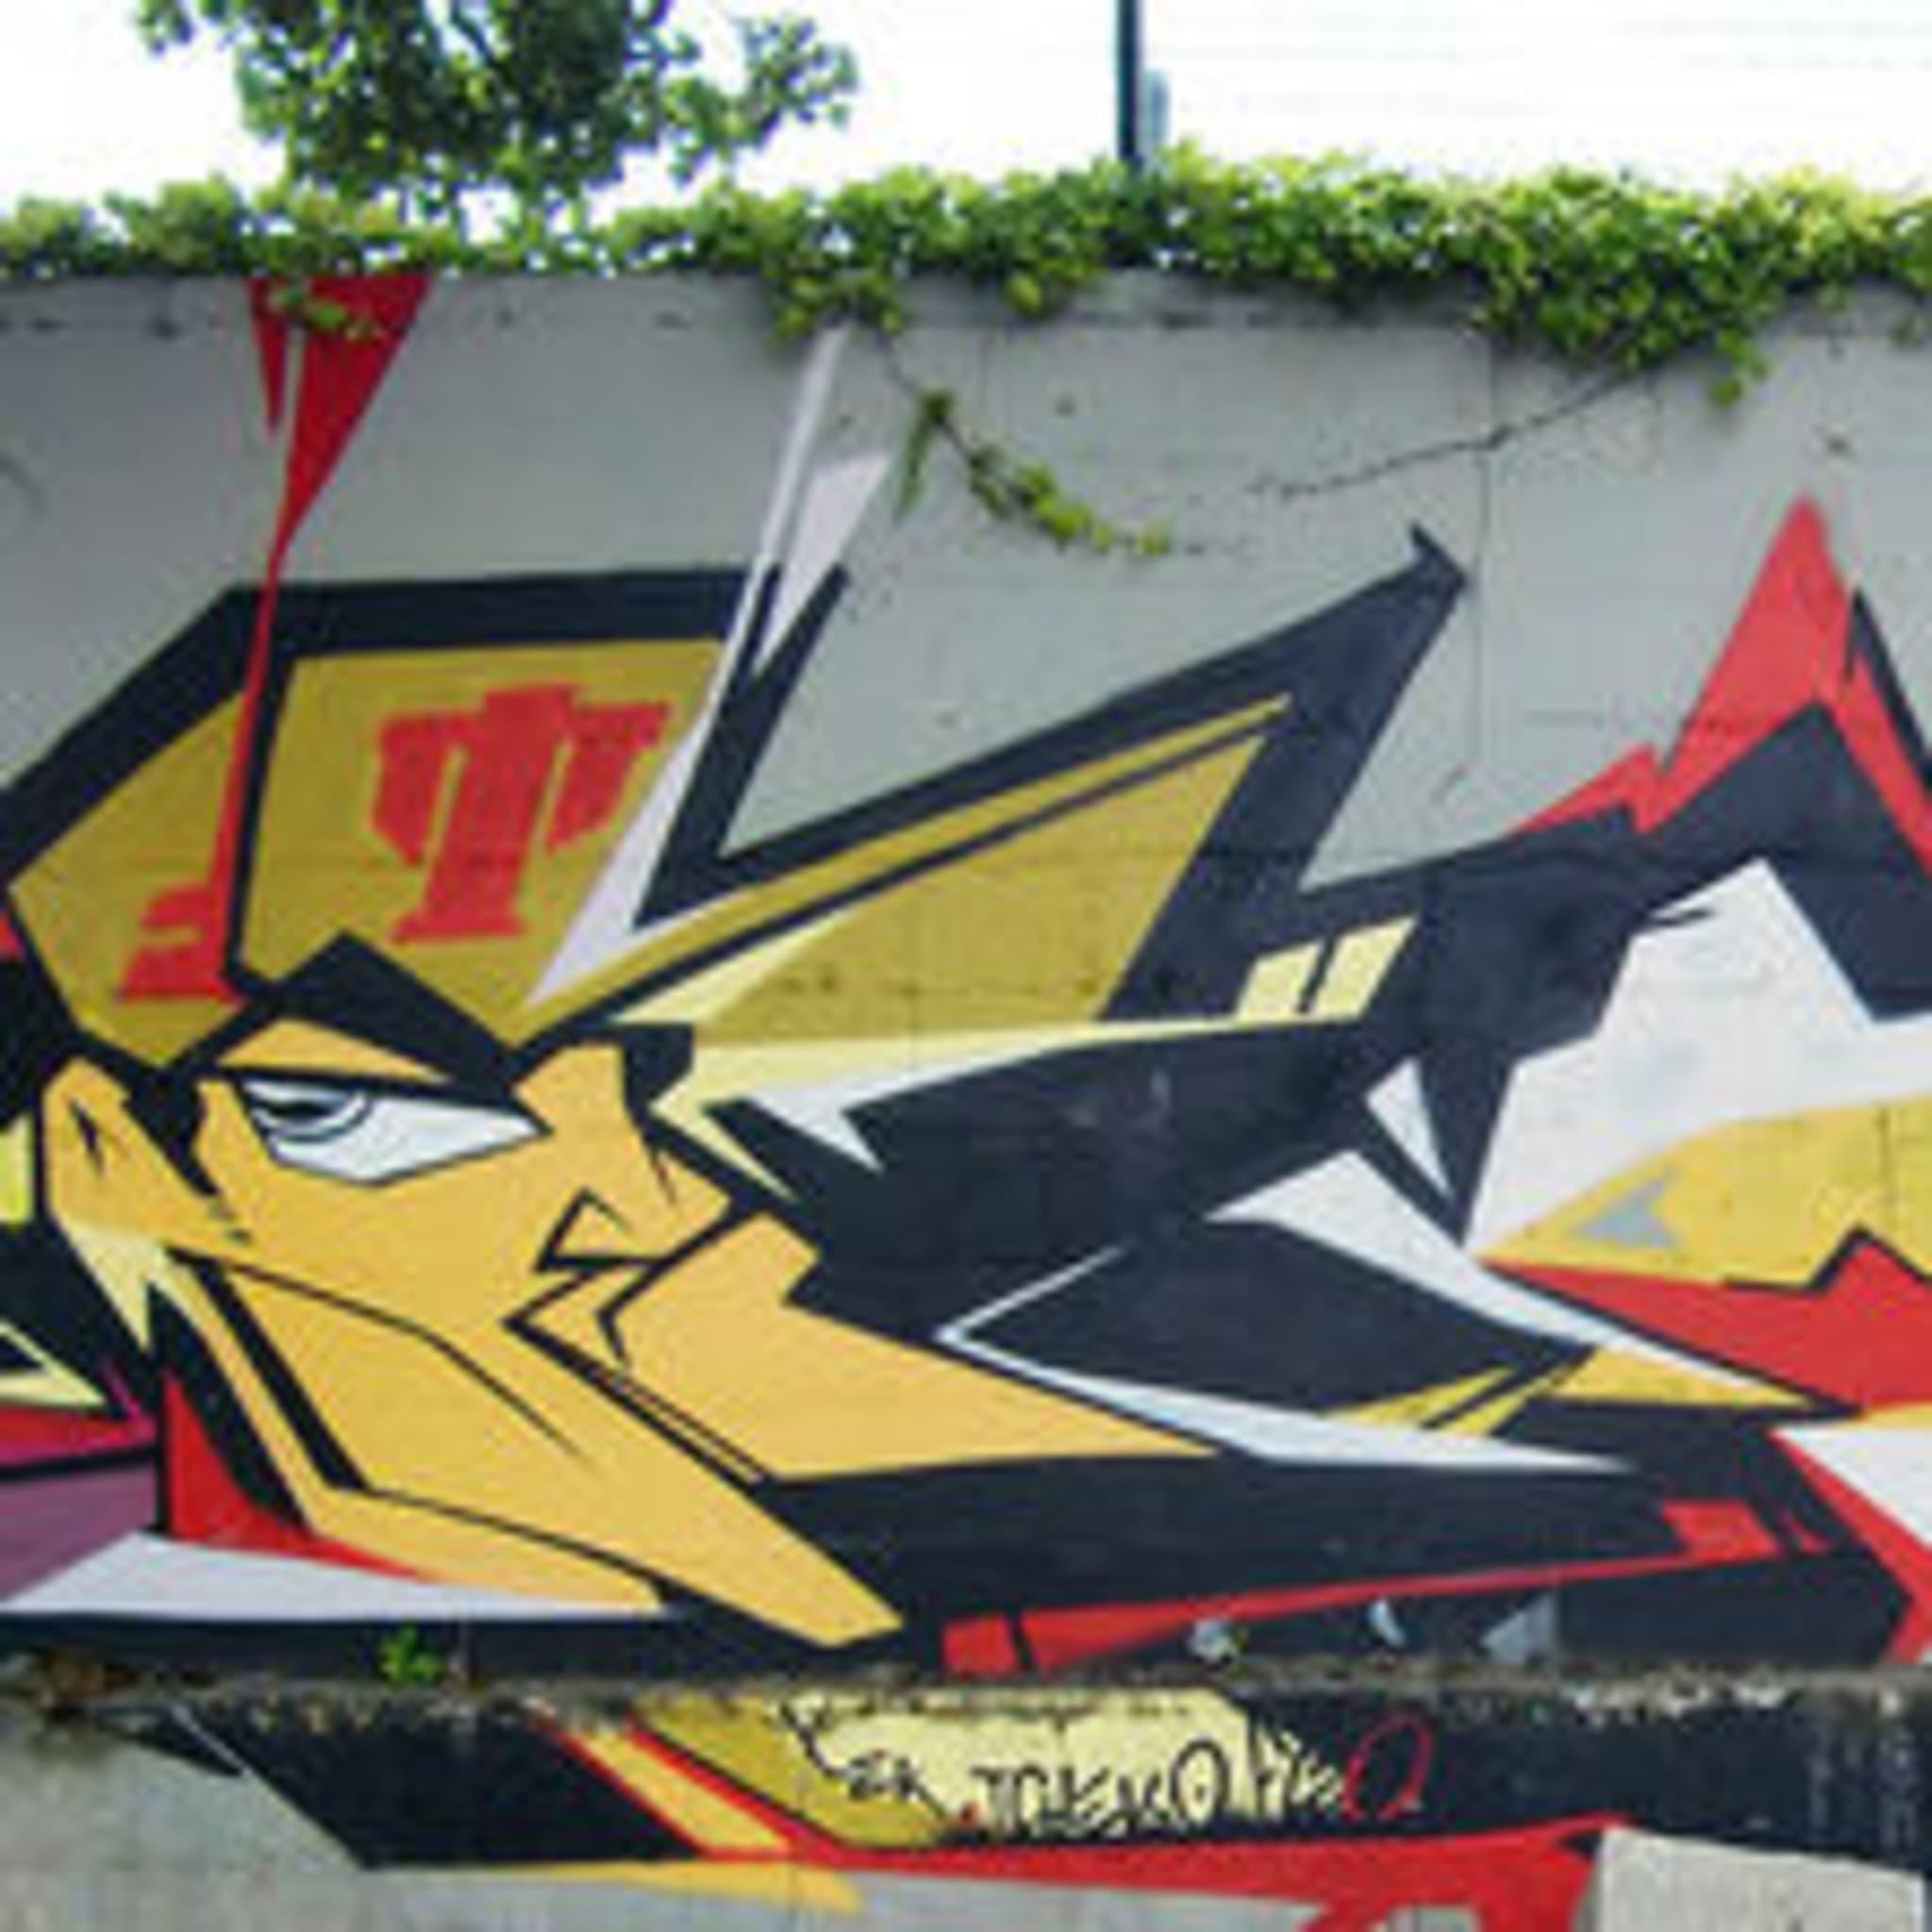 Artwork By Lek in Bobigny